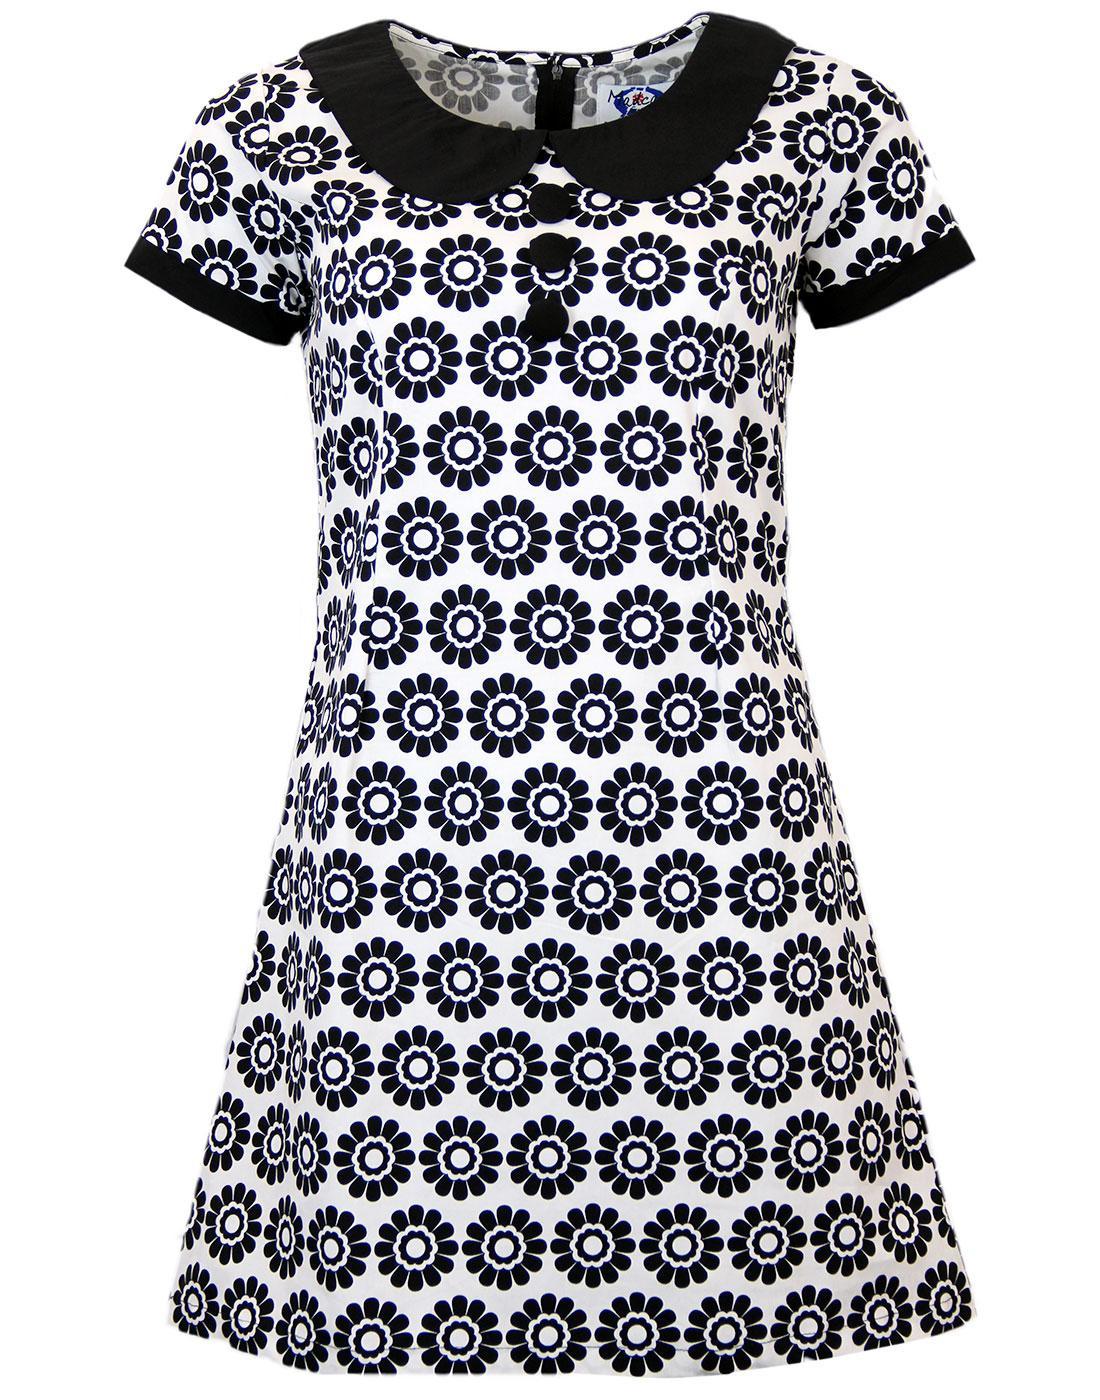 Dollierocker Daisy MADCAP Mod Floral Dress (White)